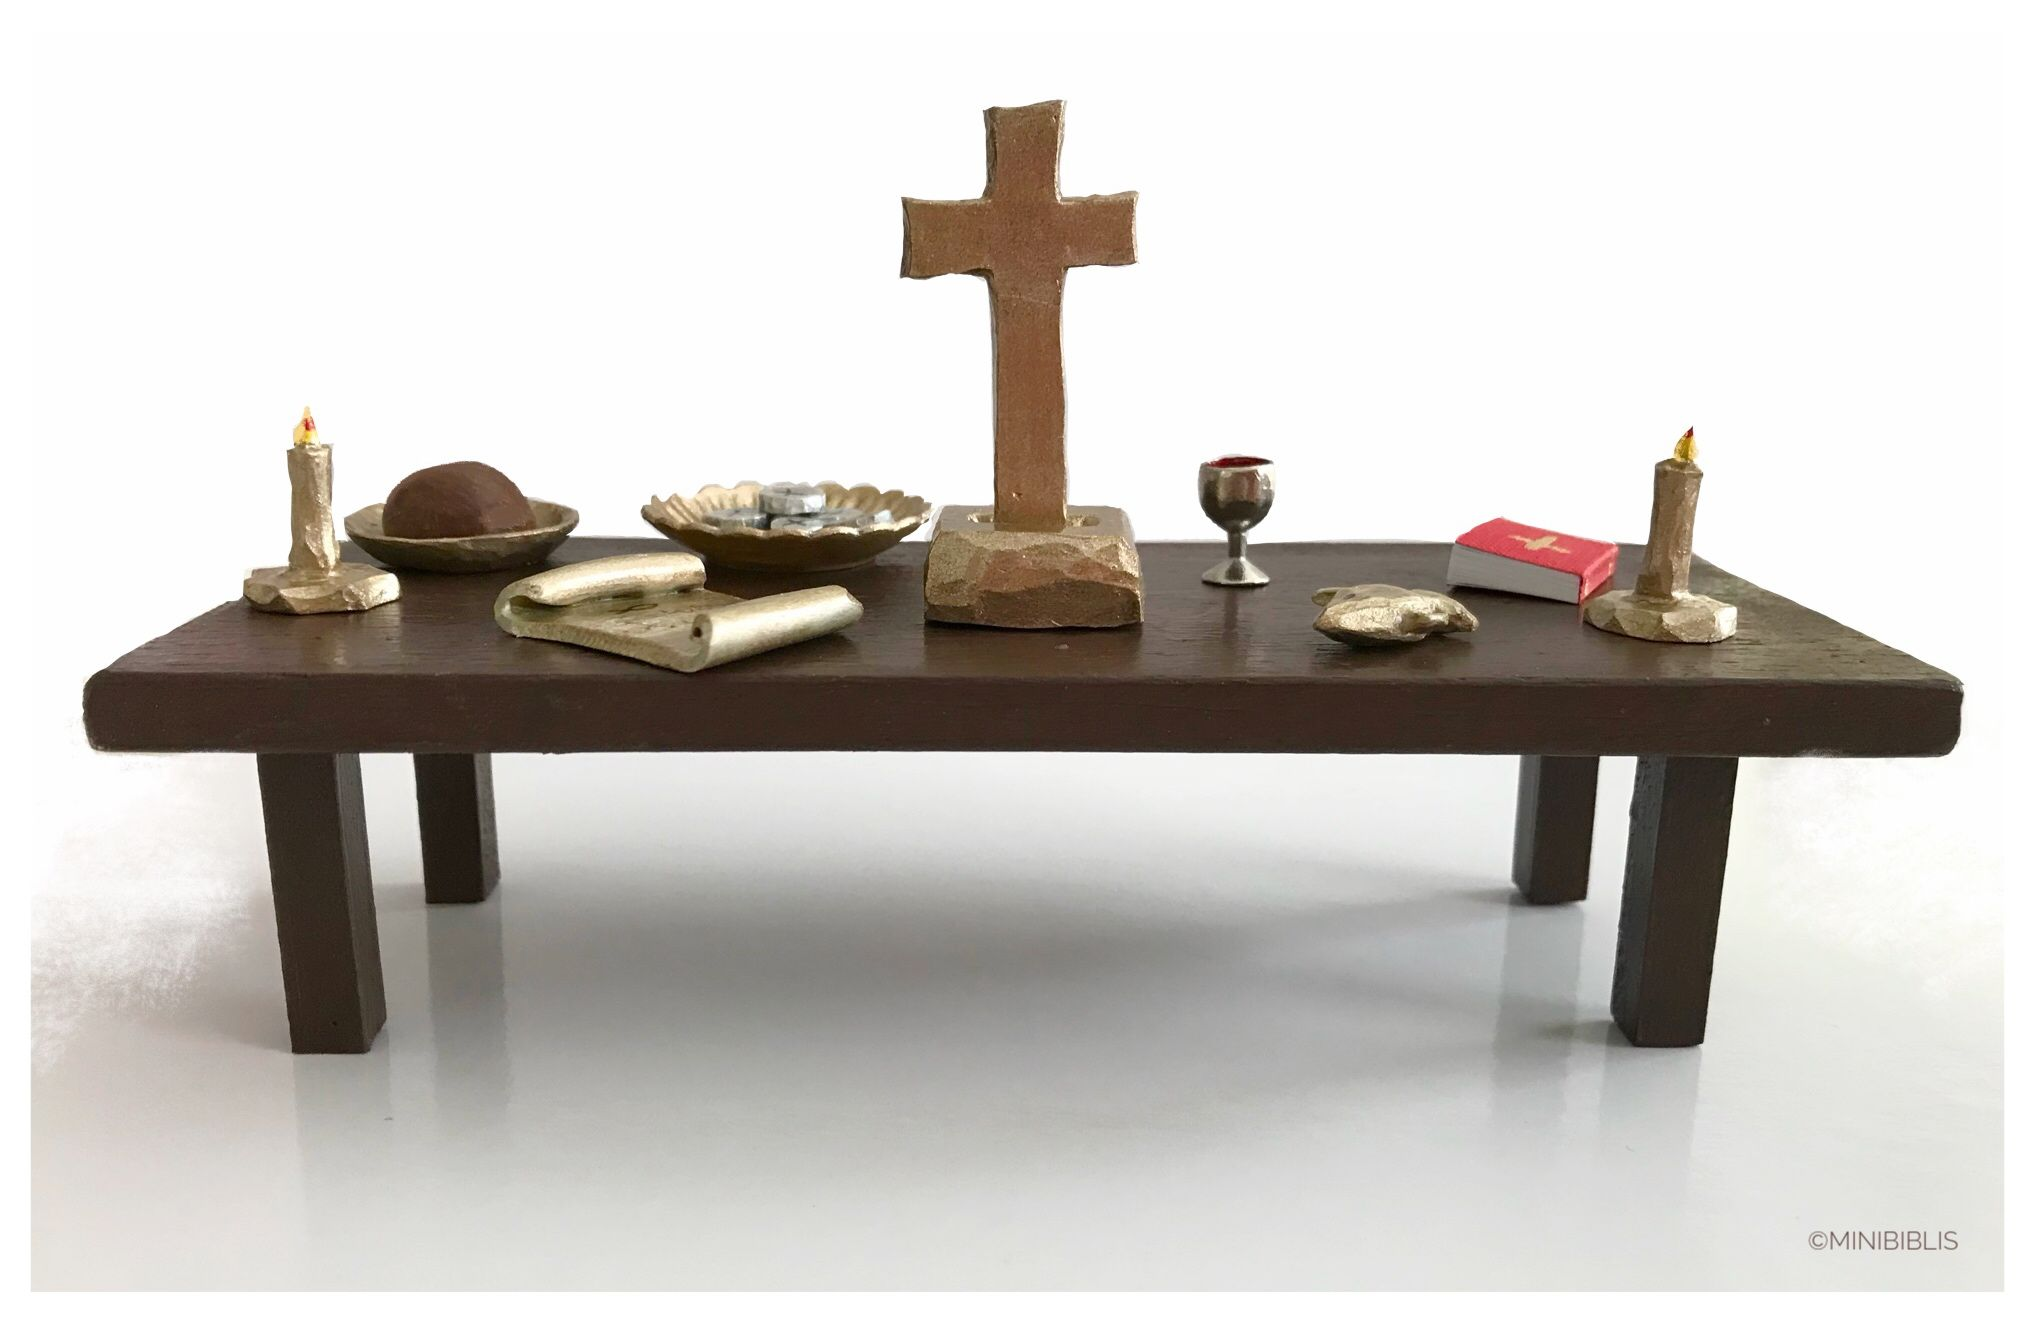 Last Supper Set Peg Dolls Apostles Jesus With Symbols Attributes